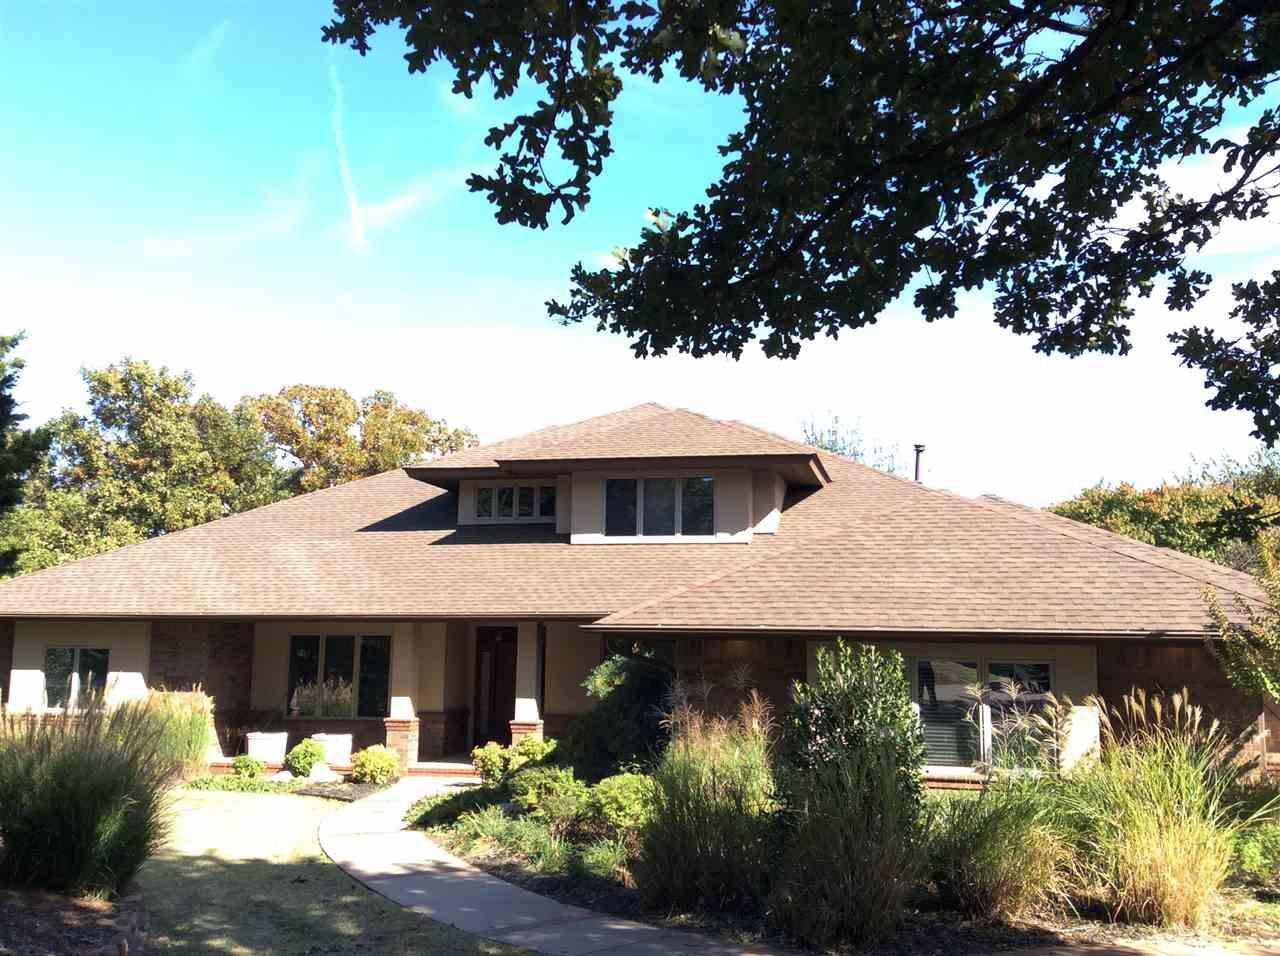 Residential for sale in stillwater oklahoma 114113 for Stillwater dream homes